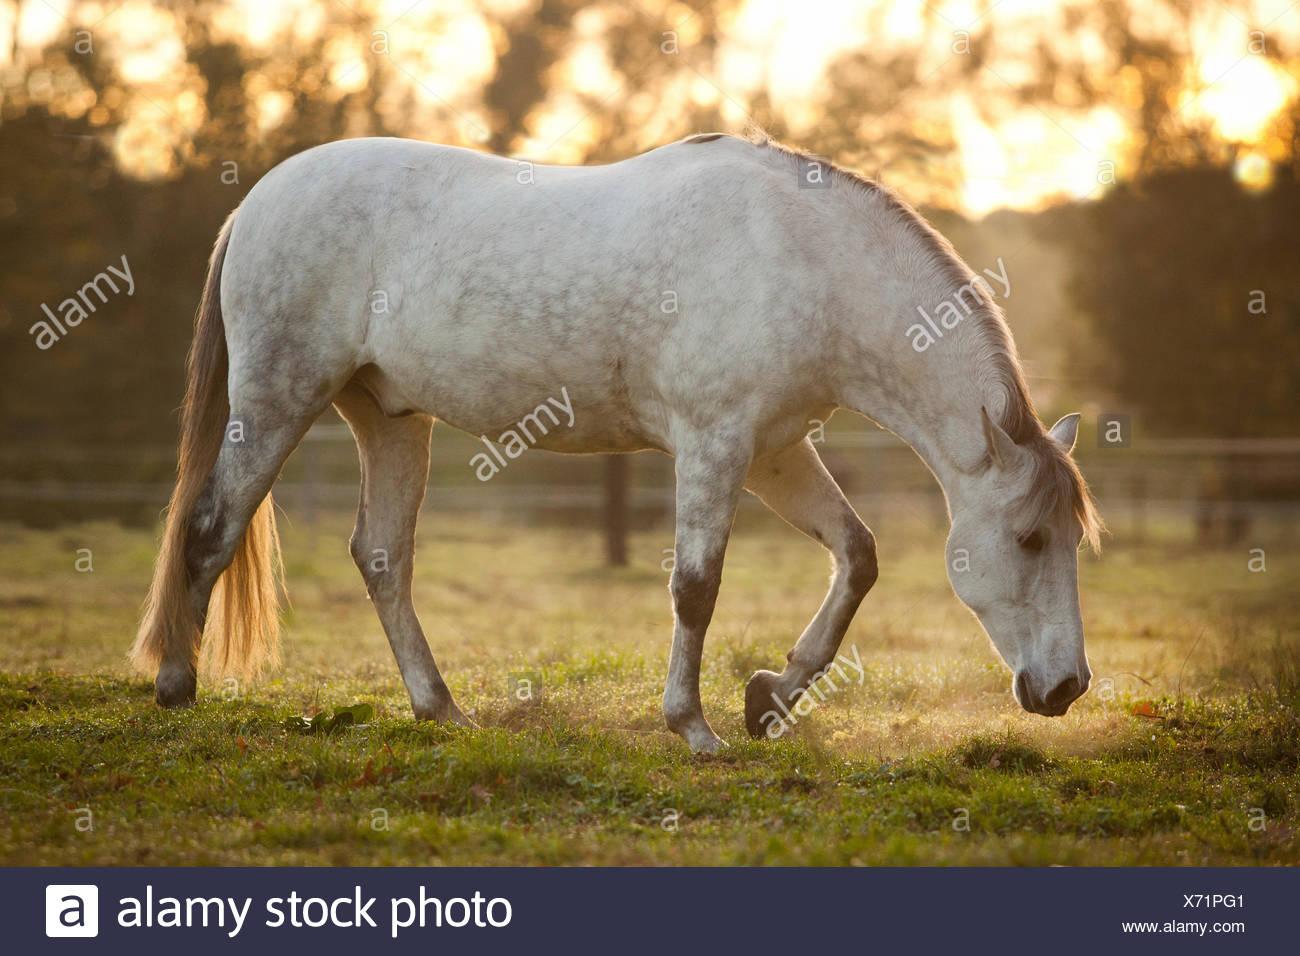 PRE, dapple gray, gelding on meadow in morning light - Stock Image